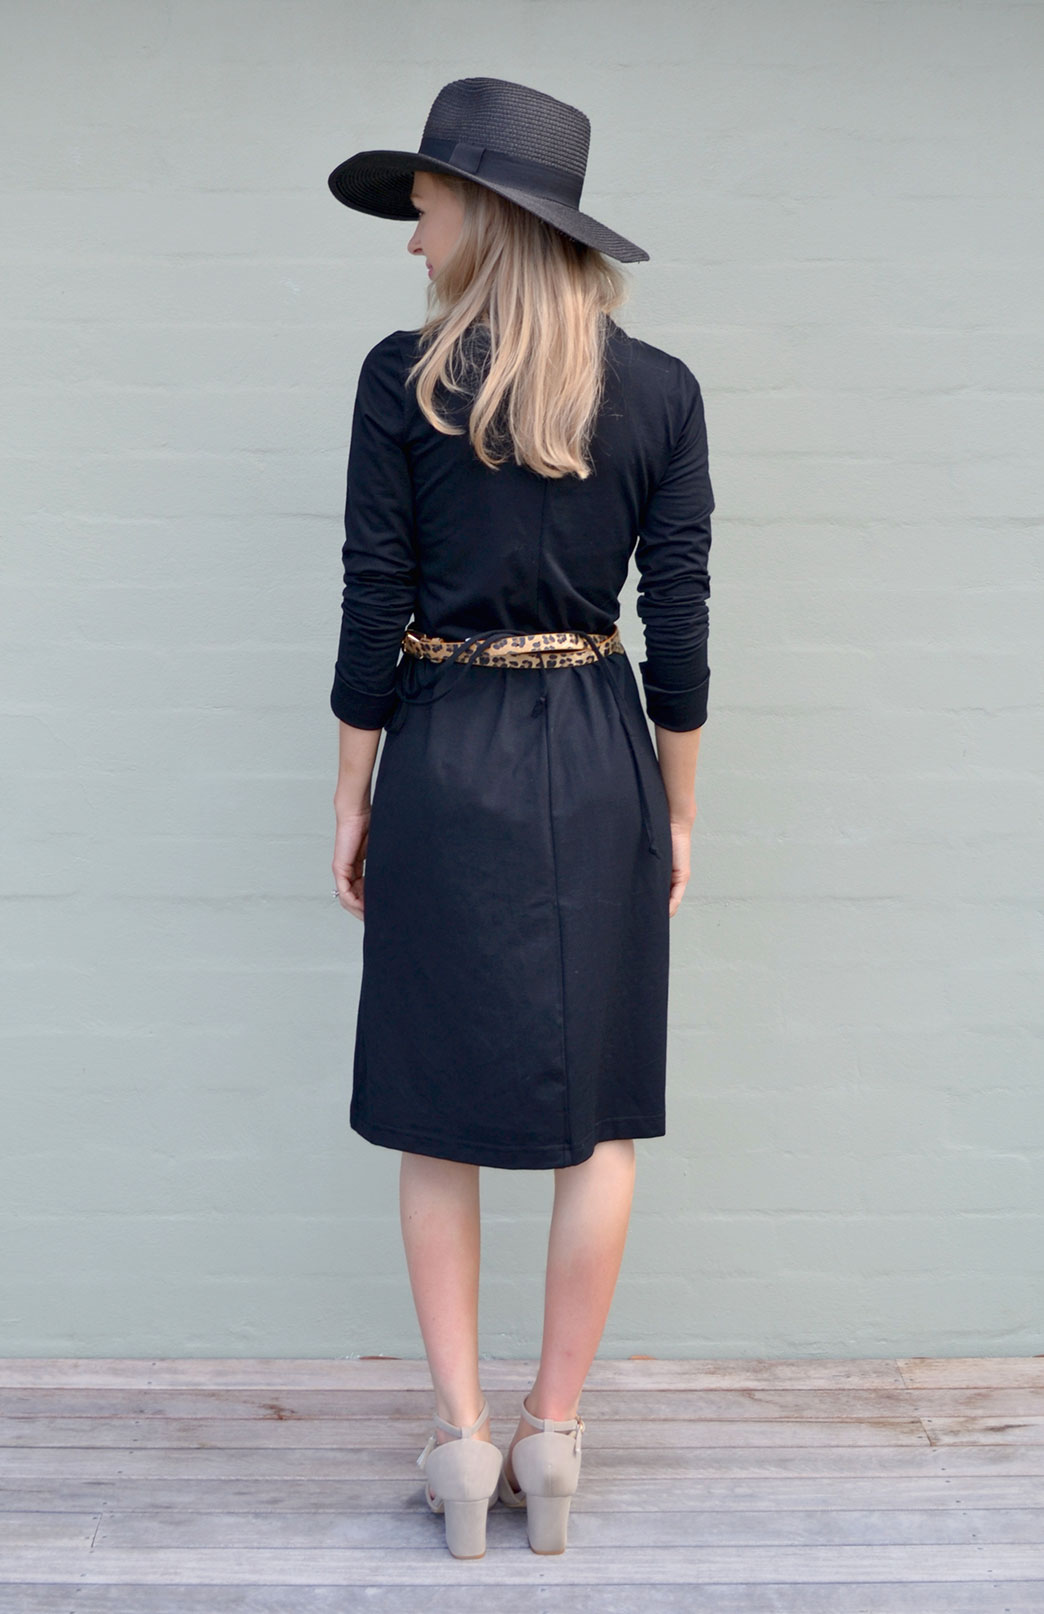 6e2e1e43987b Wrap Dress | Women's Black Merino Wool Long Sleeved Wrap Dress with ...